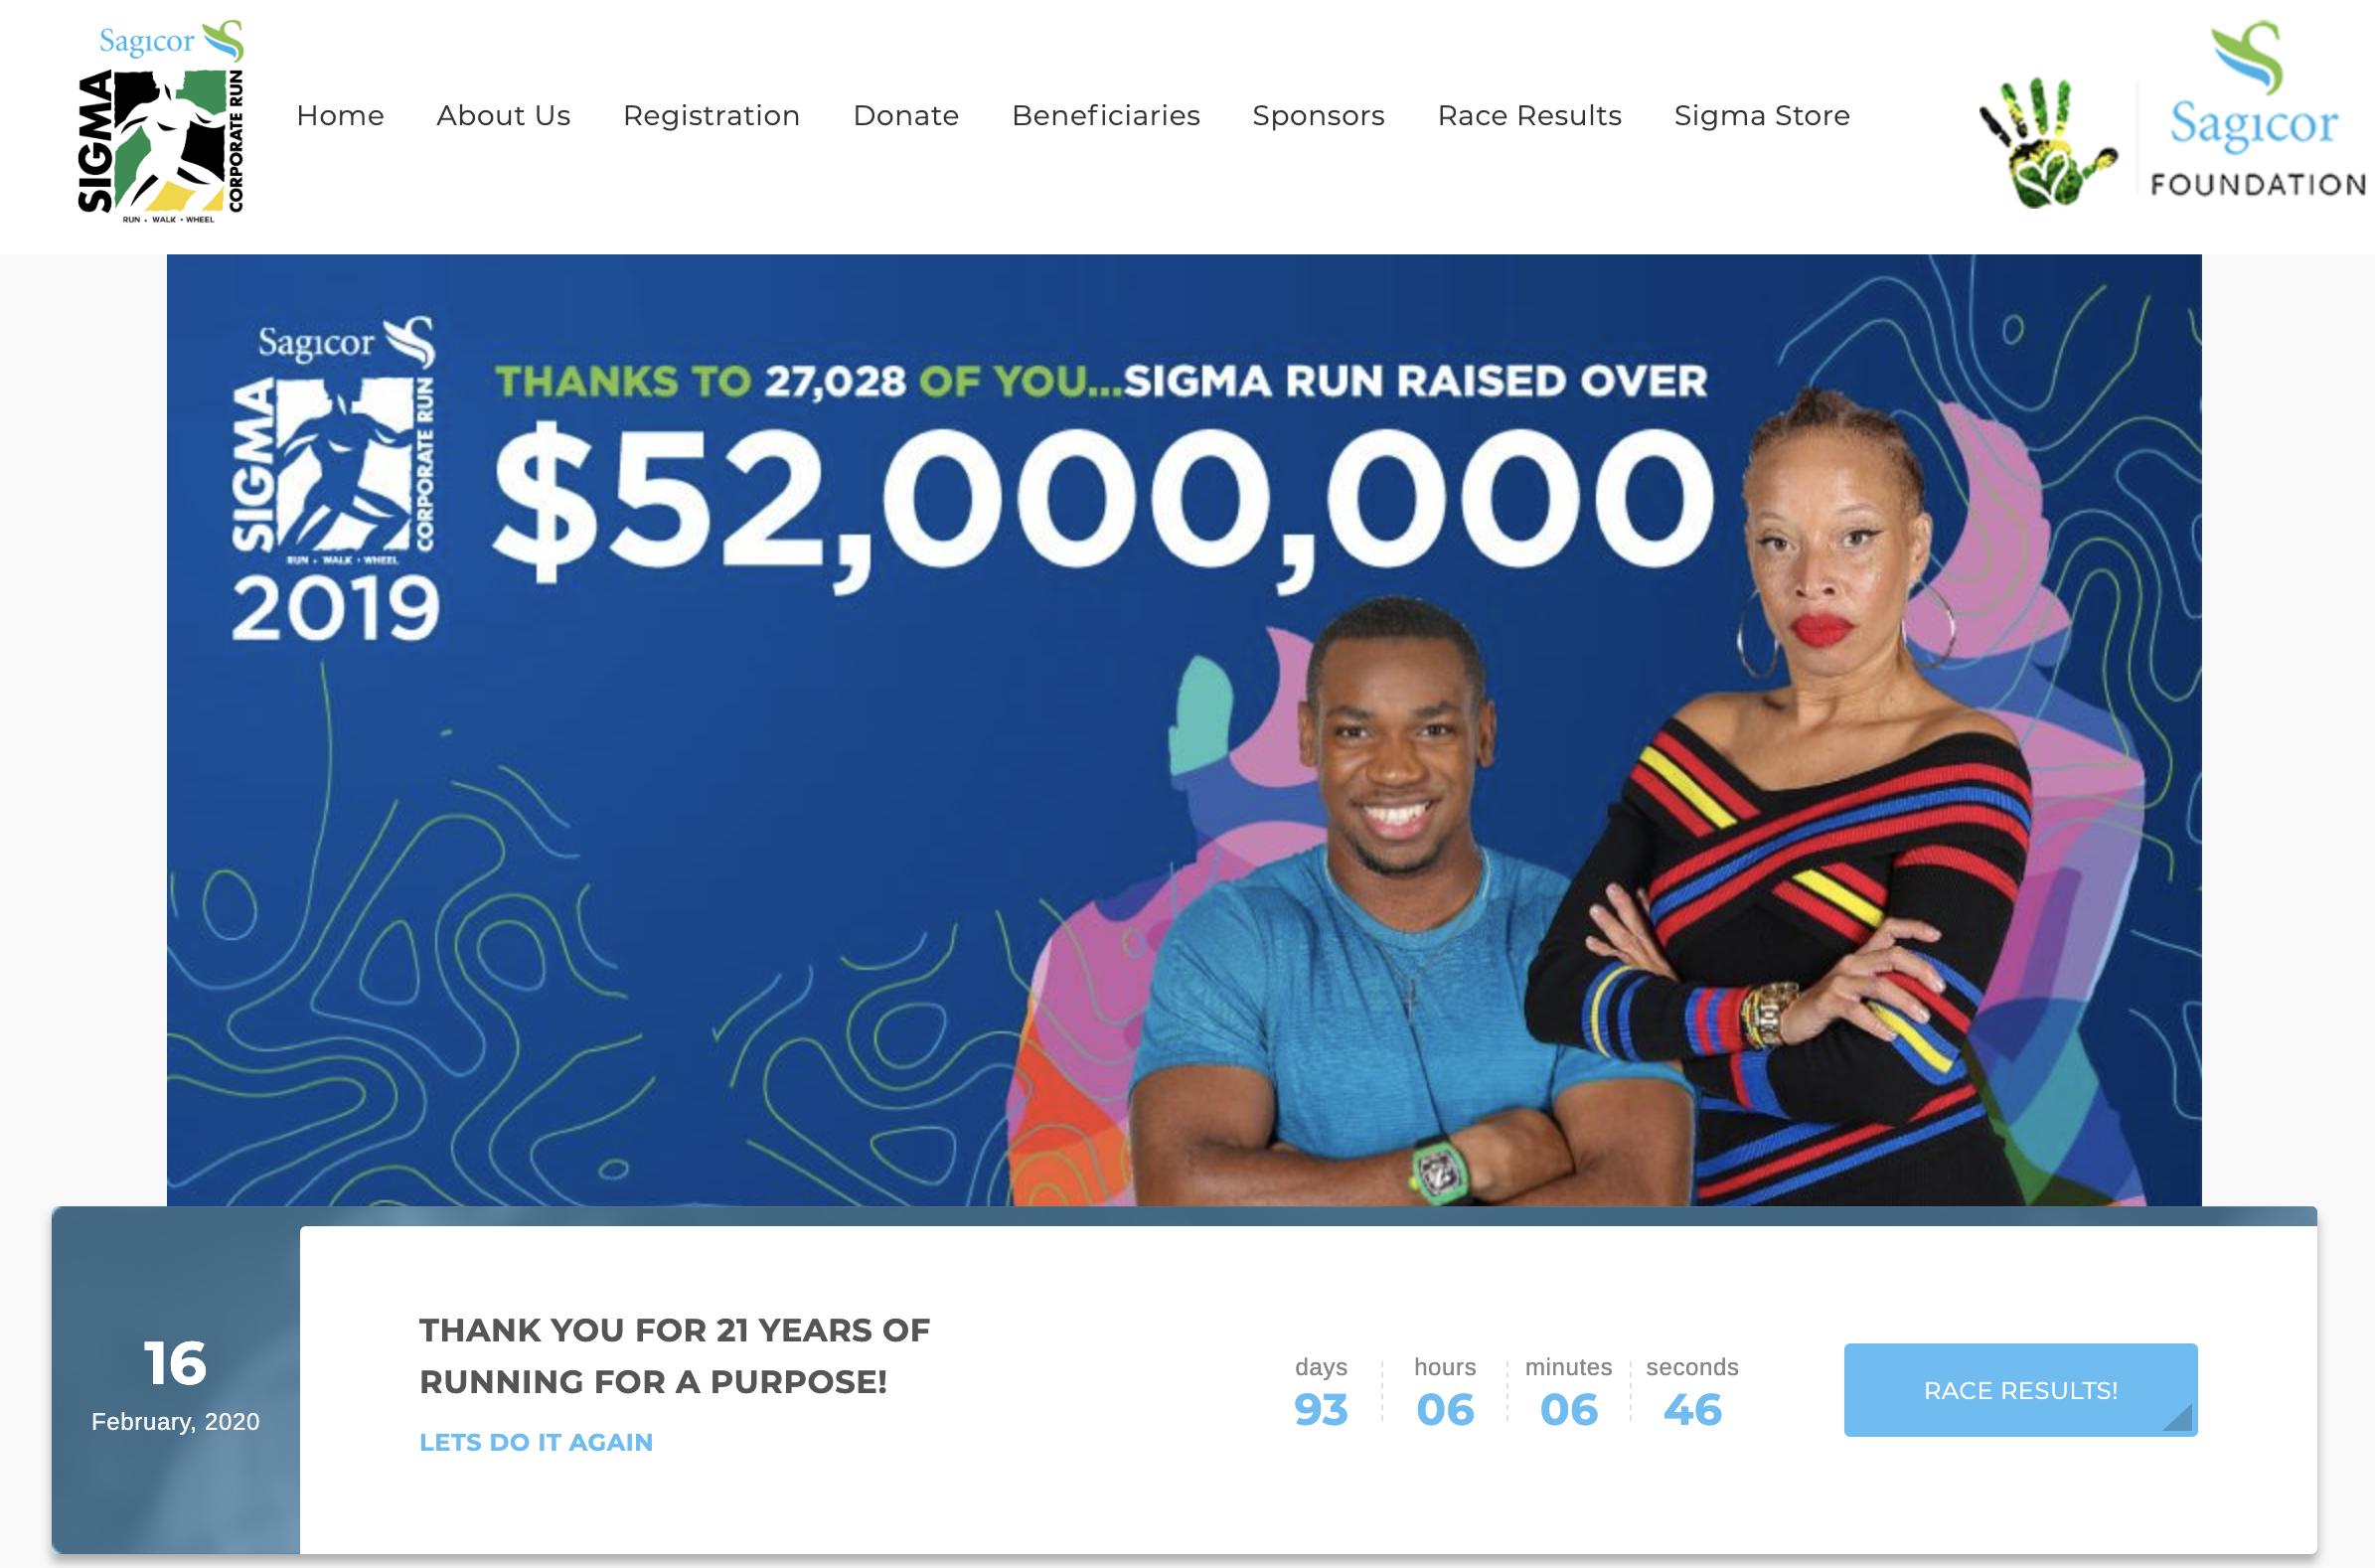 Sagicor Sigma Run Website